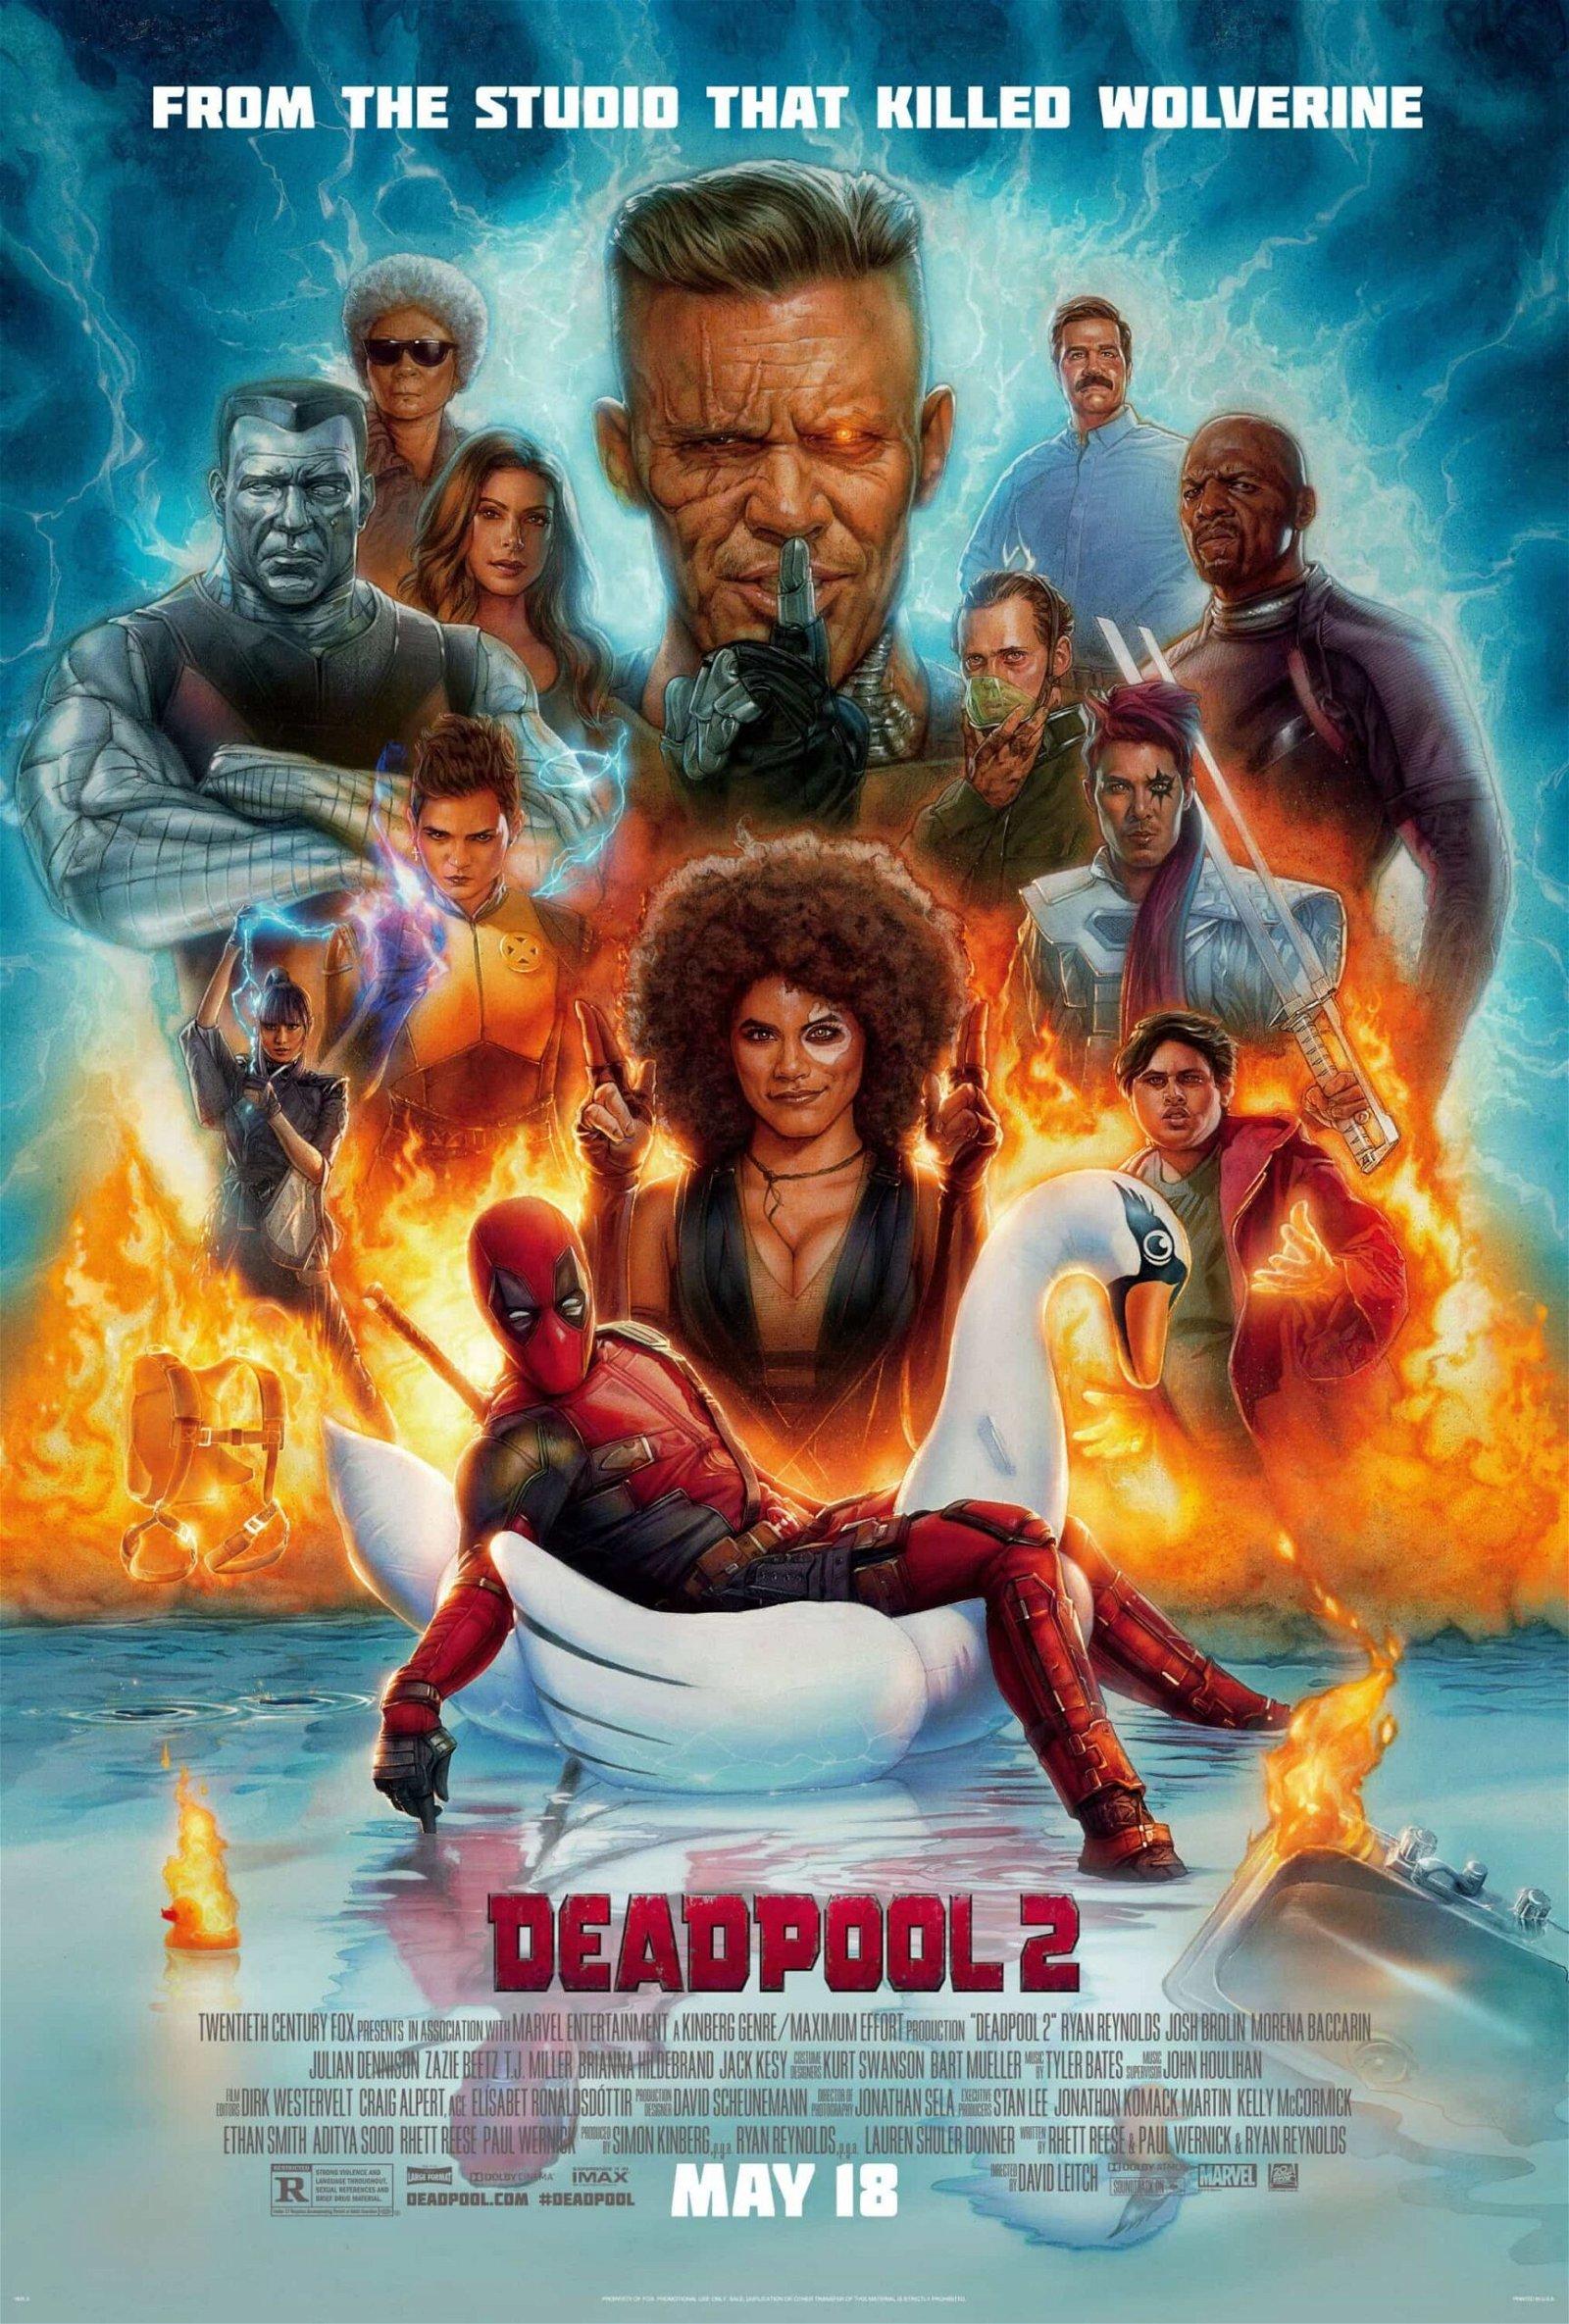 Deadpool 2 (2018) Review 2